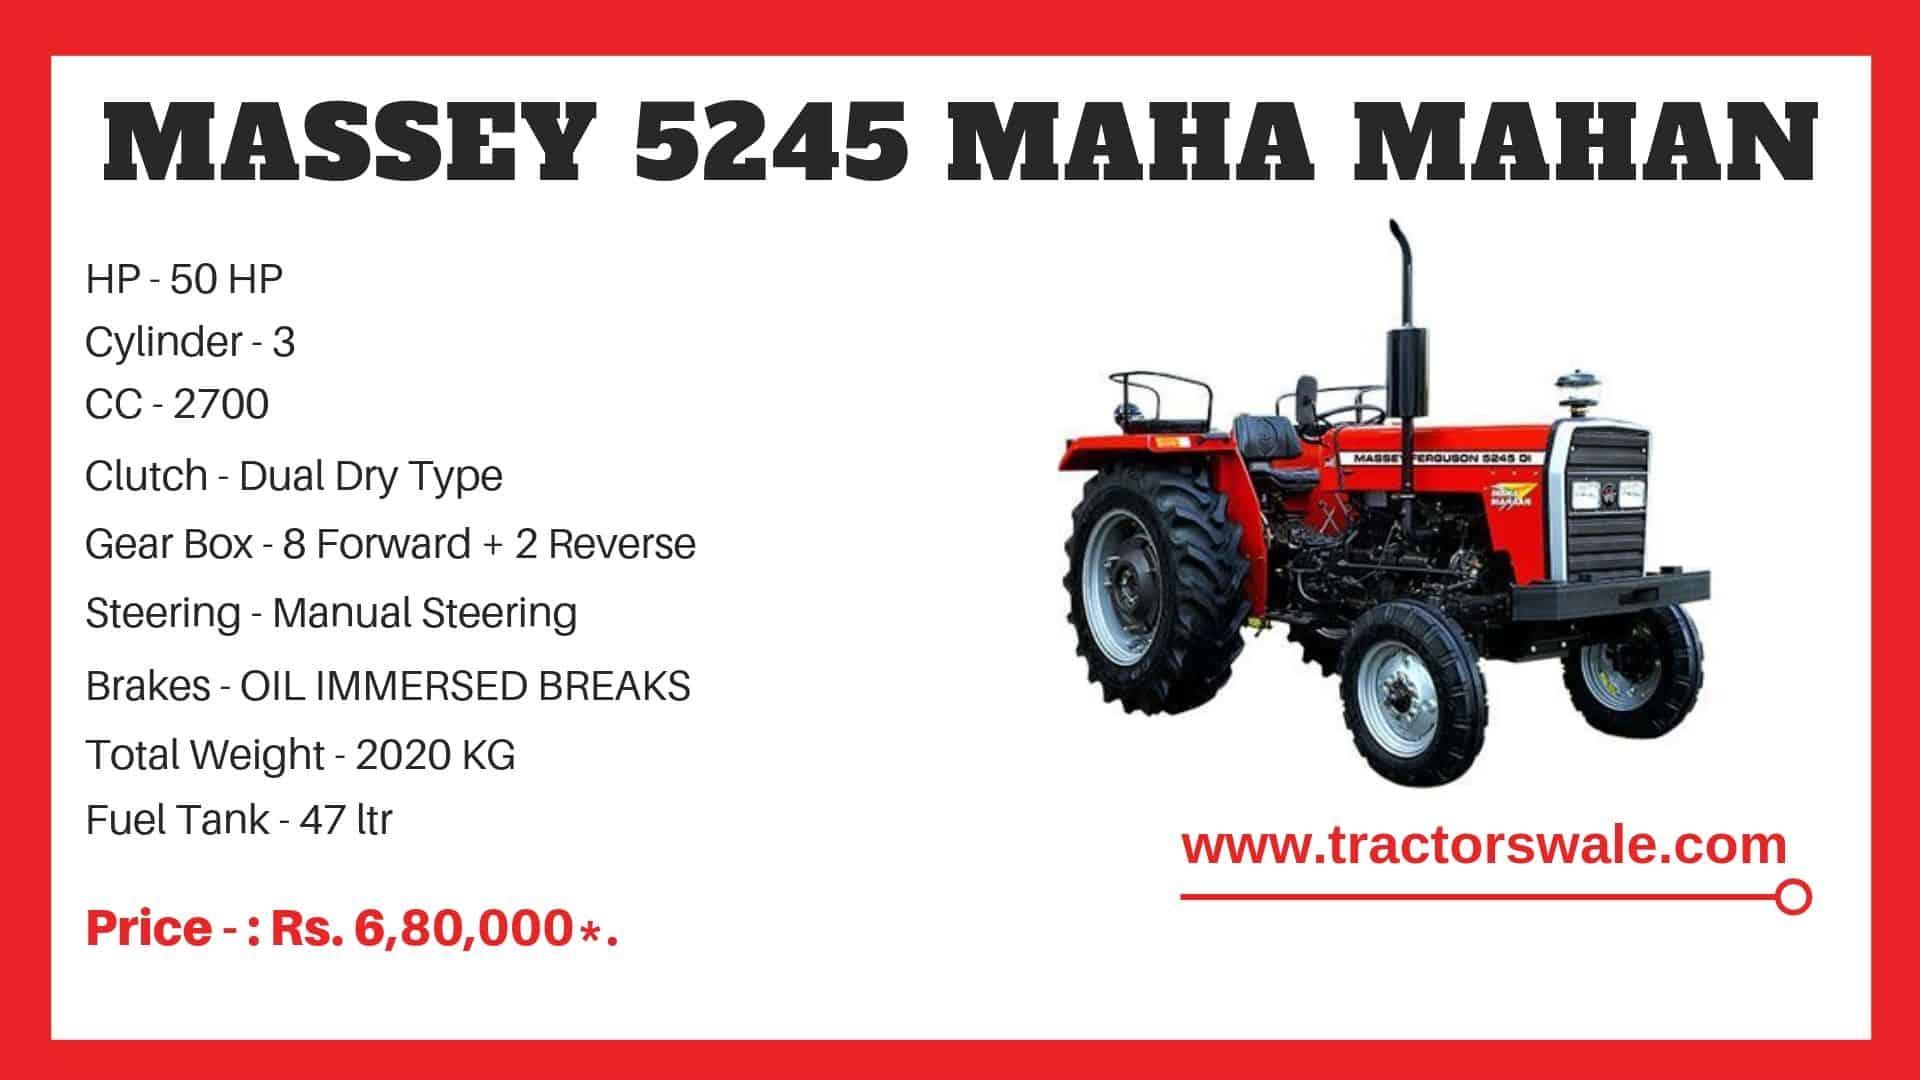 Specifications Of Massey Ferguson 5245 MAHA MAHAN